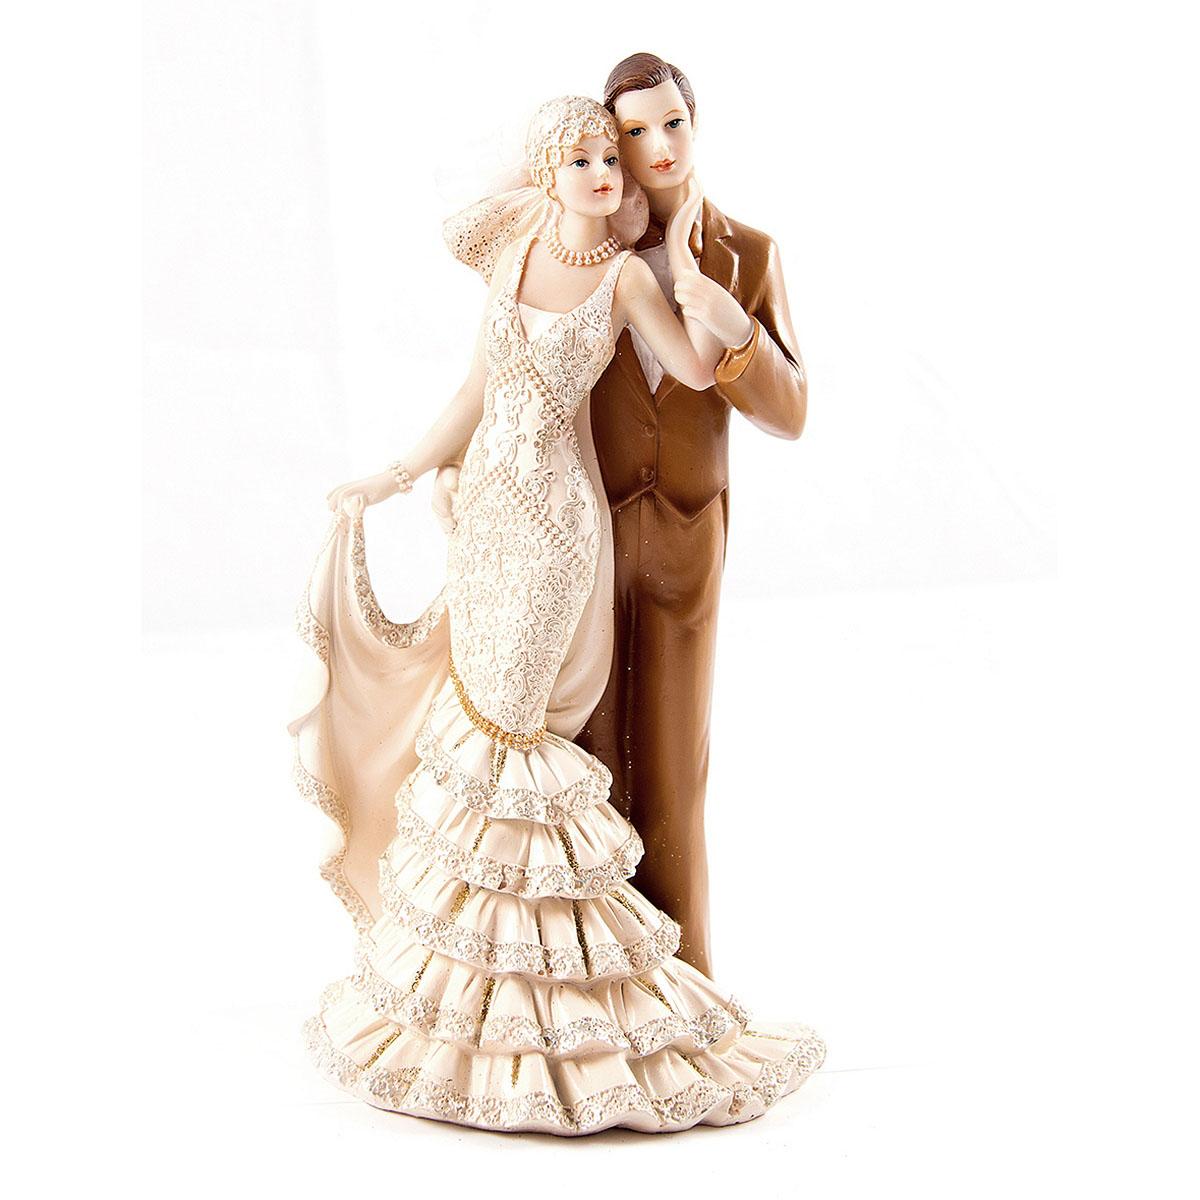 Статуэтка Русские Подарки Влюбленные, 13 х 11 х 22 см статуэтка русские подарки мисс рандеву 11 х 10 х 31 см